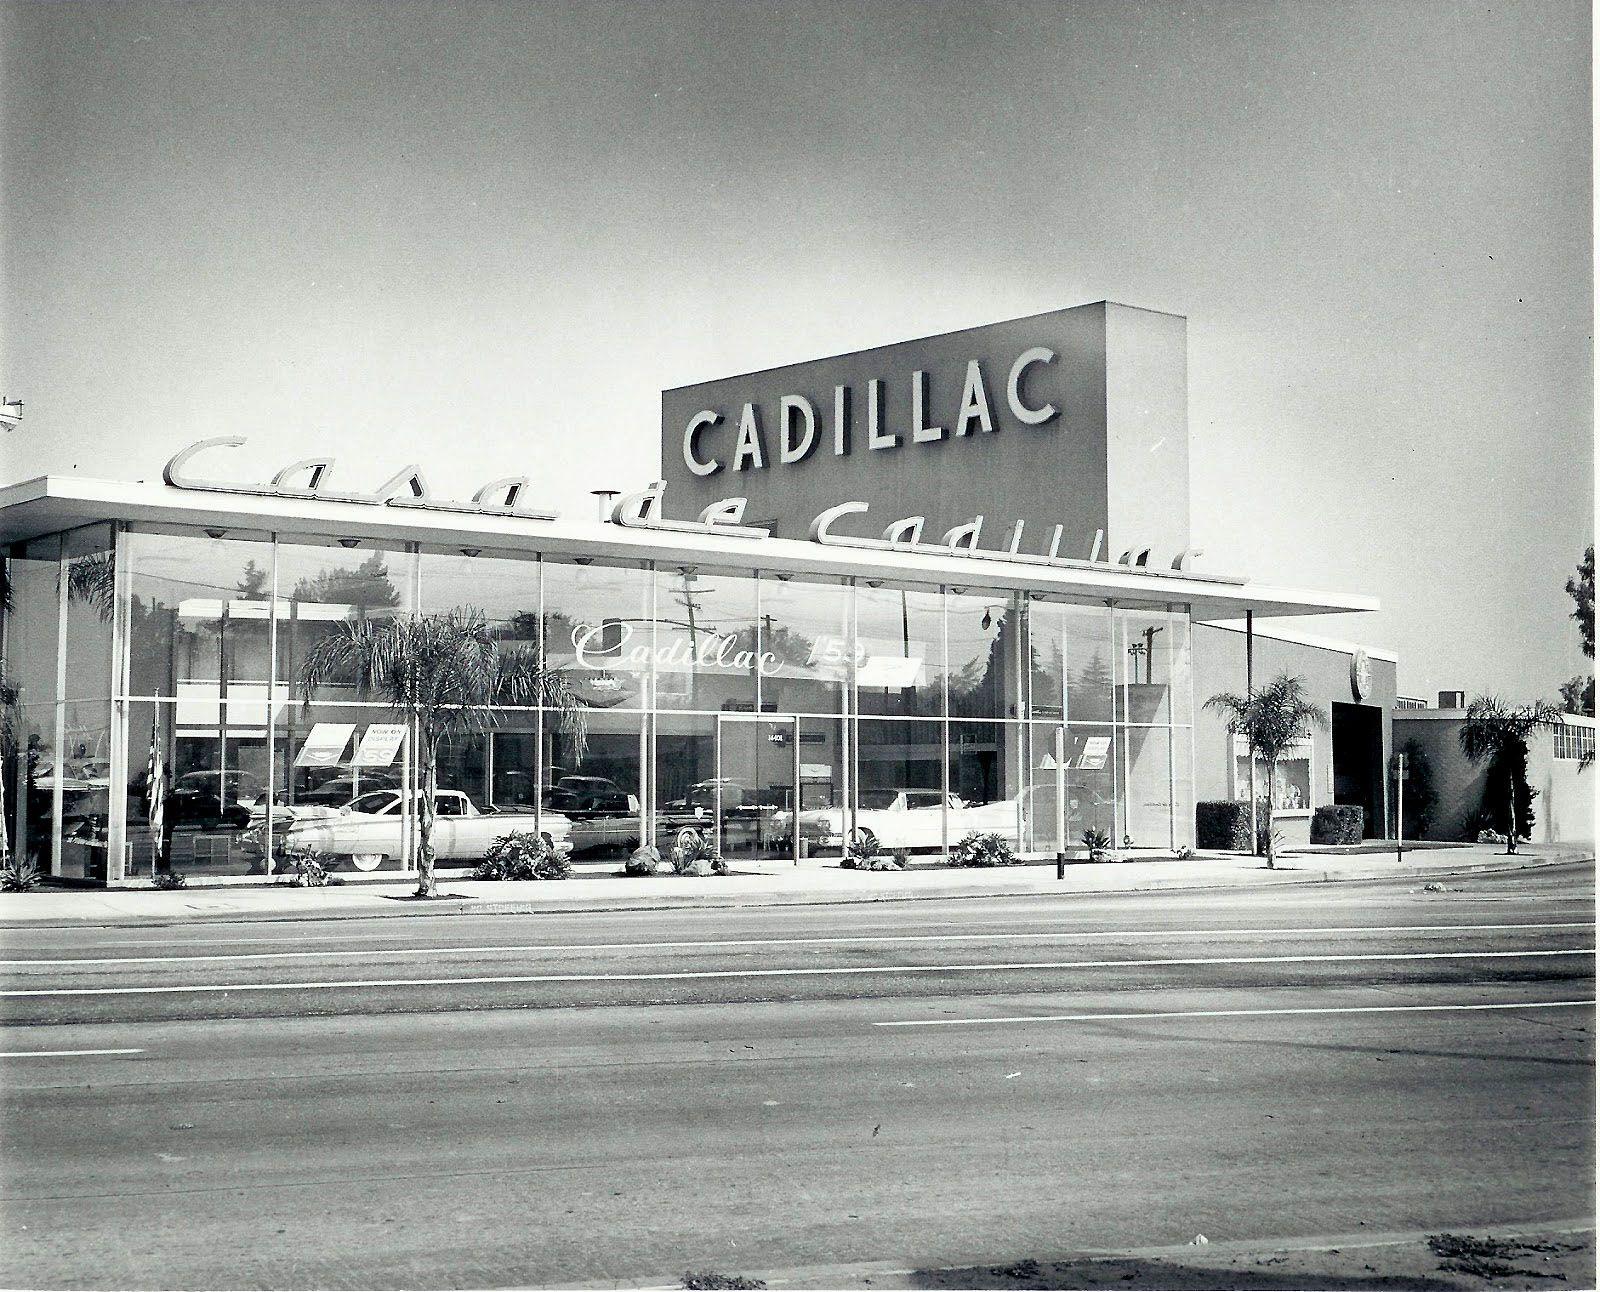 Casa De Cadillac 1959 Casa Automotive Group Cadillac 1959